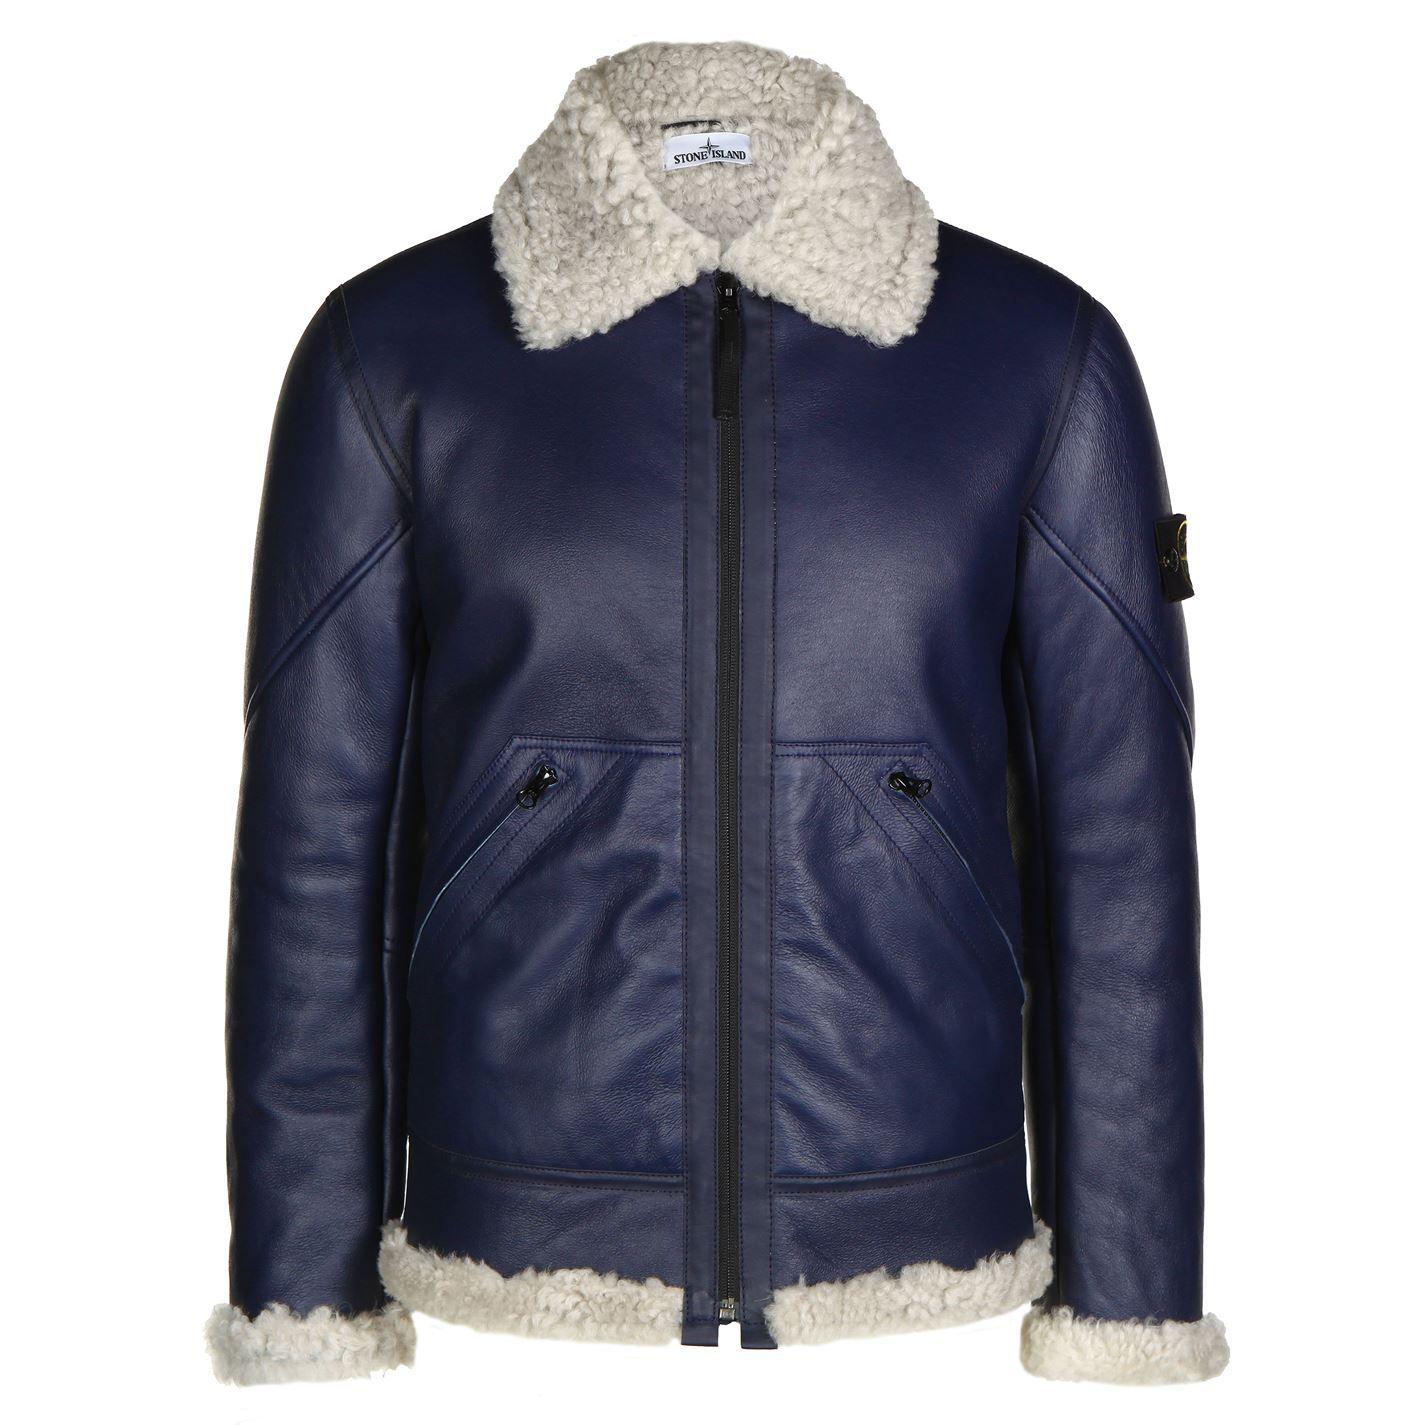 Junior Boys Rainforest Zip Jacket Sheepskin Jacket Kids Outerwear Jackets [ 1425 x 1425 Pixel ]